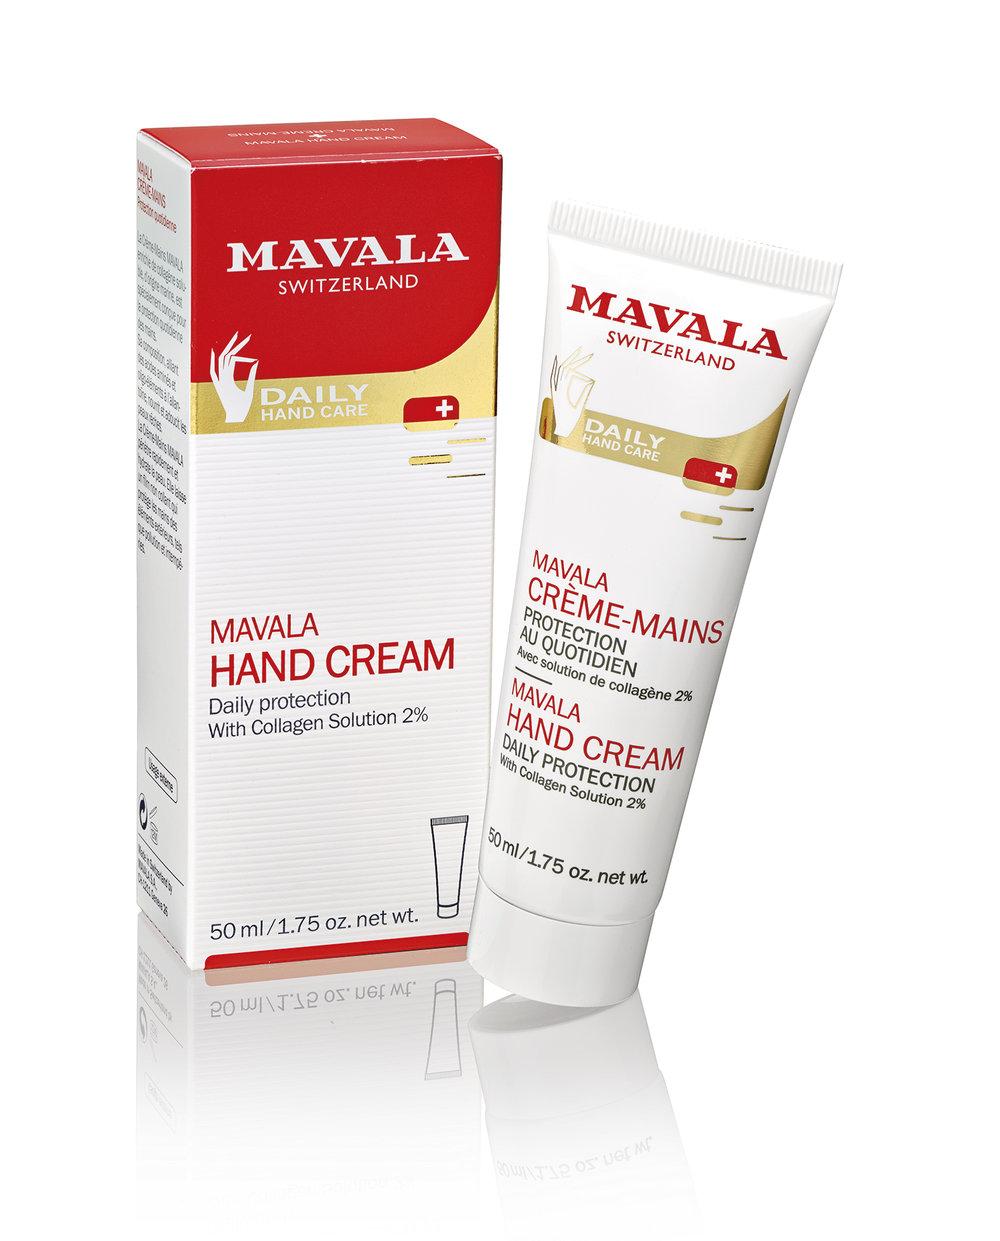 Mavala-hand-cream.jpg